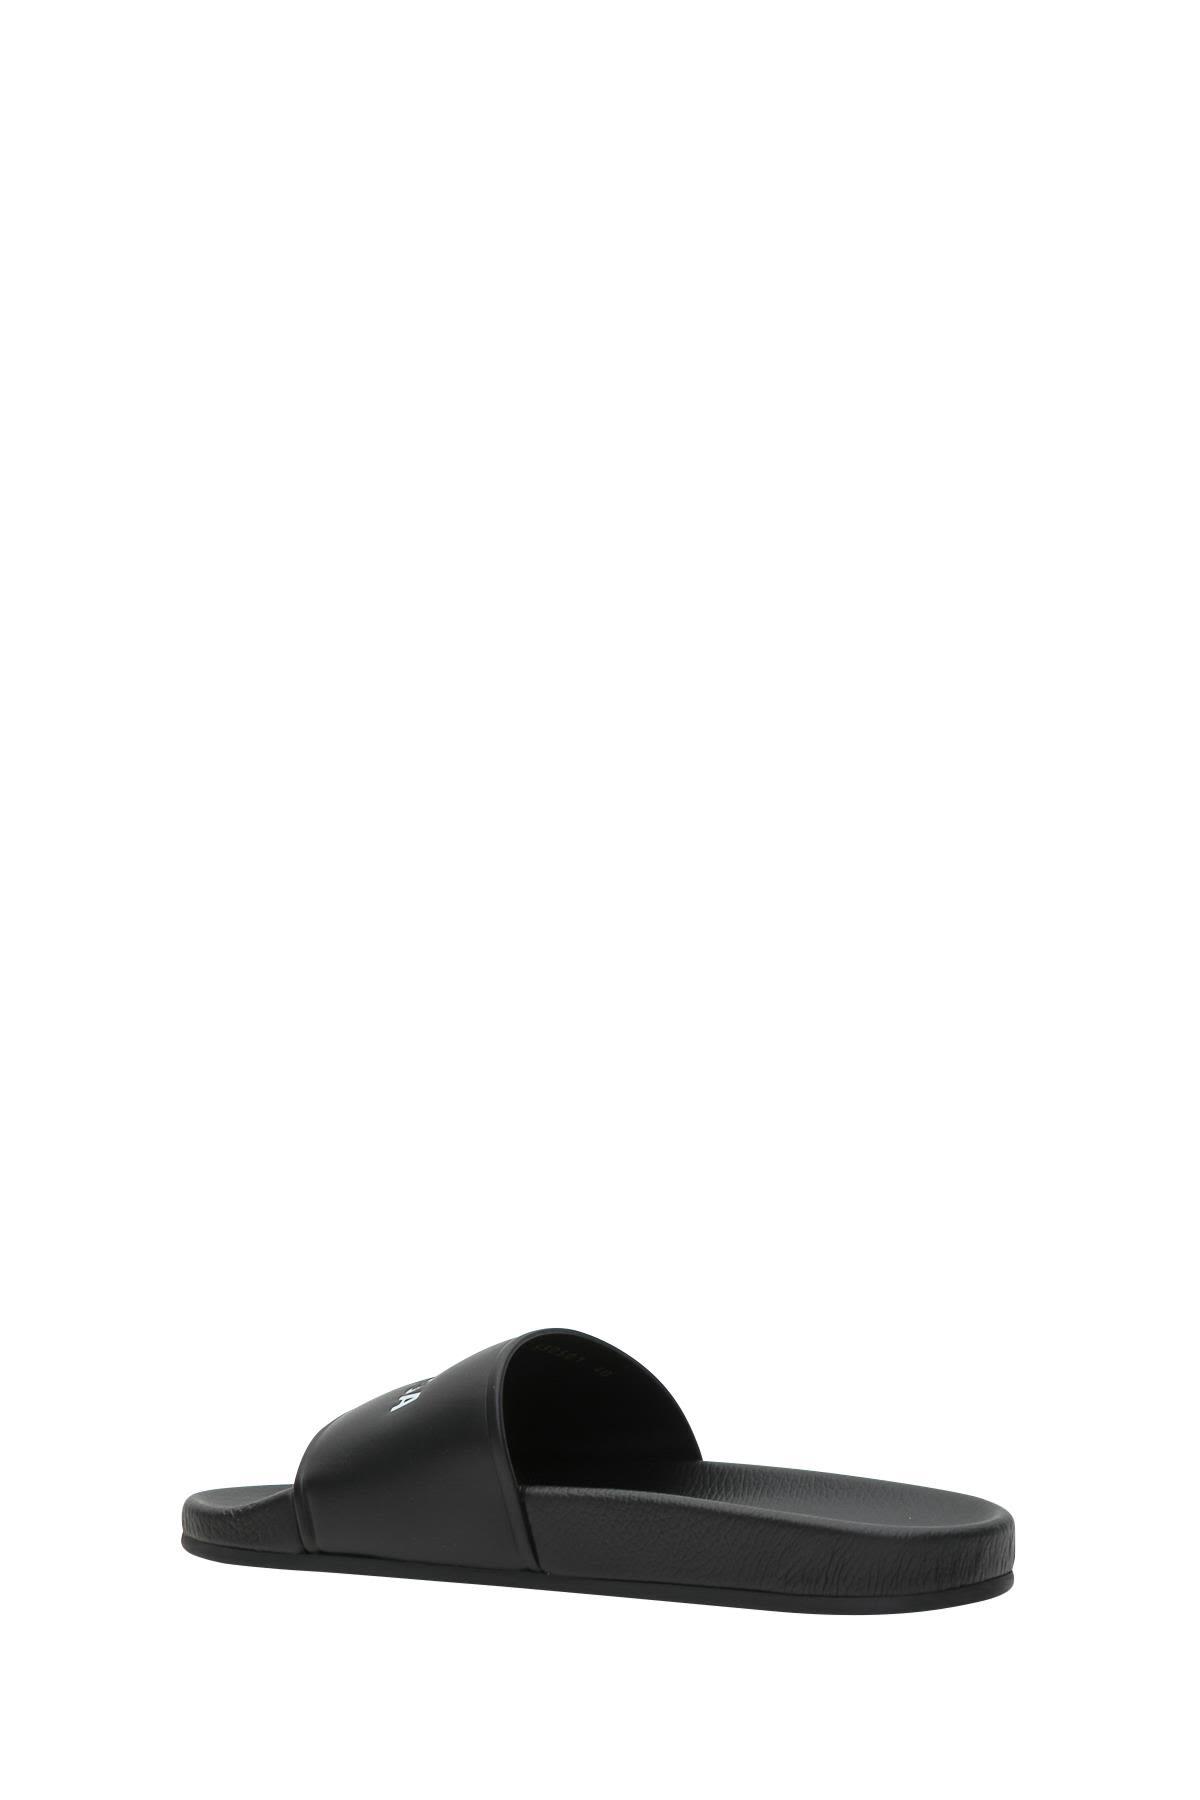 46a261403b8d Balenciaga Balenciaga Piscine Flat Sandals - Nero bianco - 10889271 ...